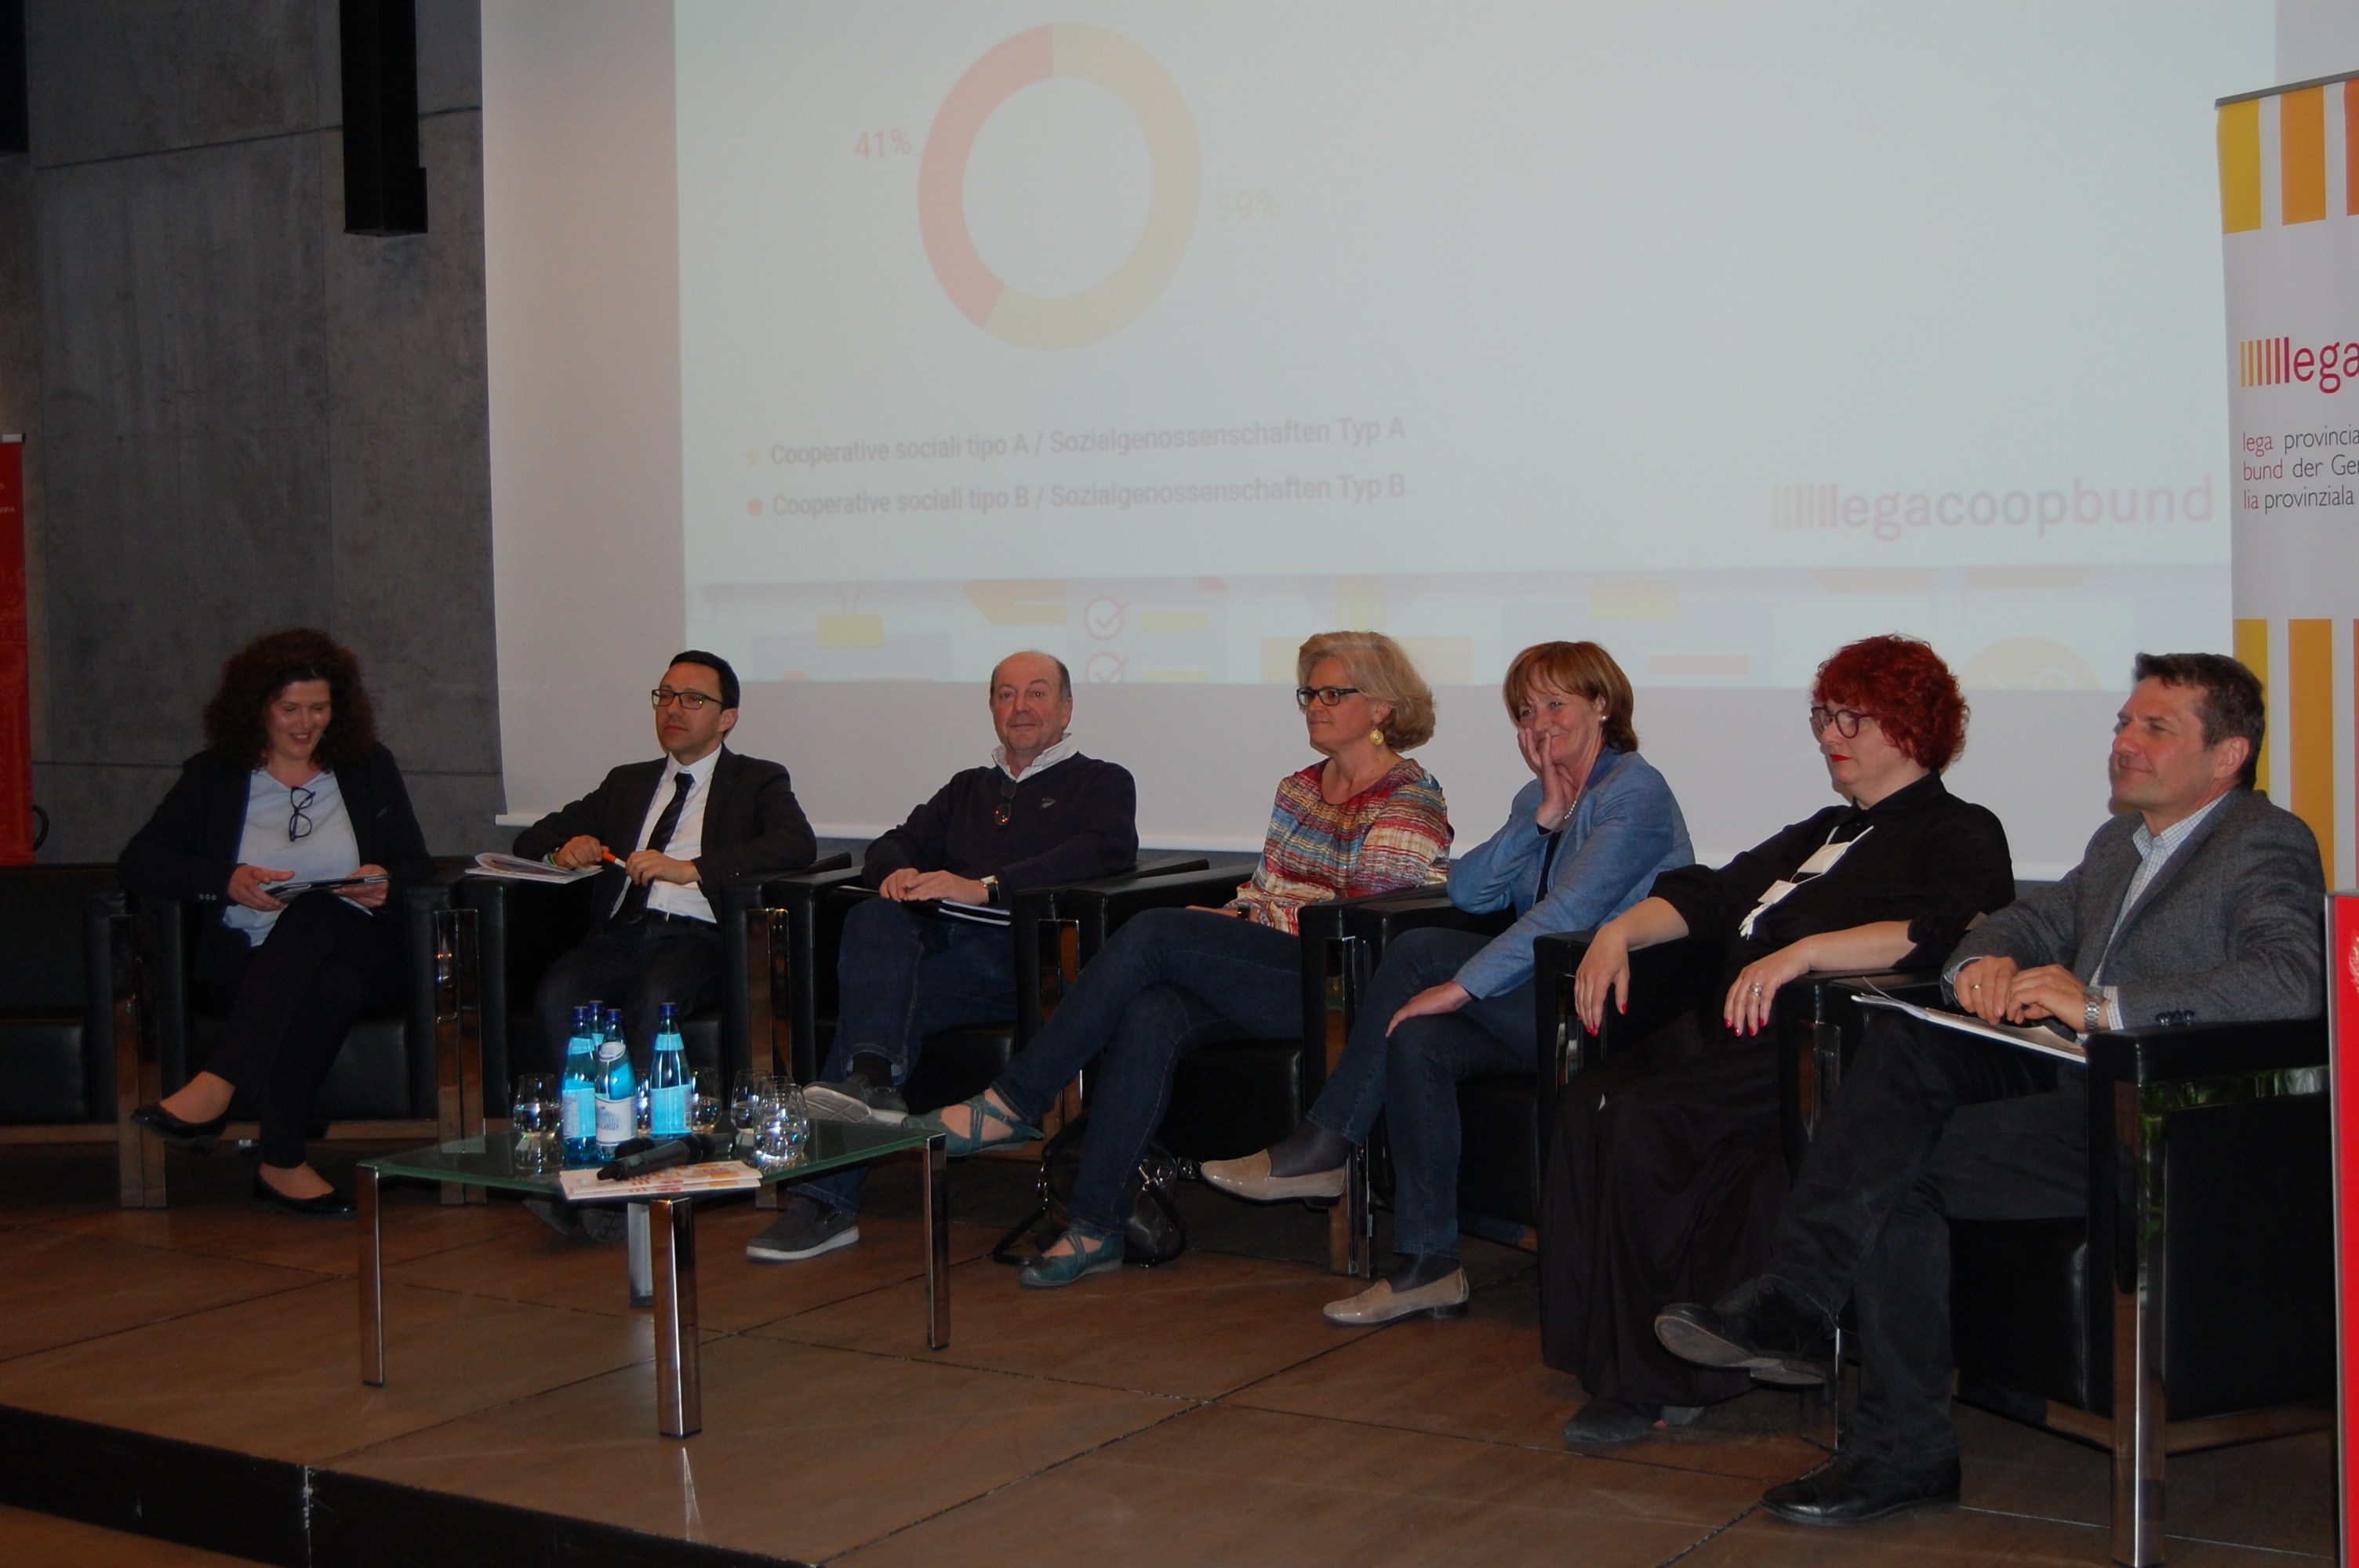 tavola rotonda conferenza cooperative sociali 2.0